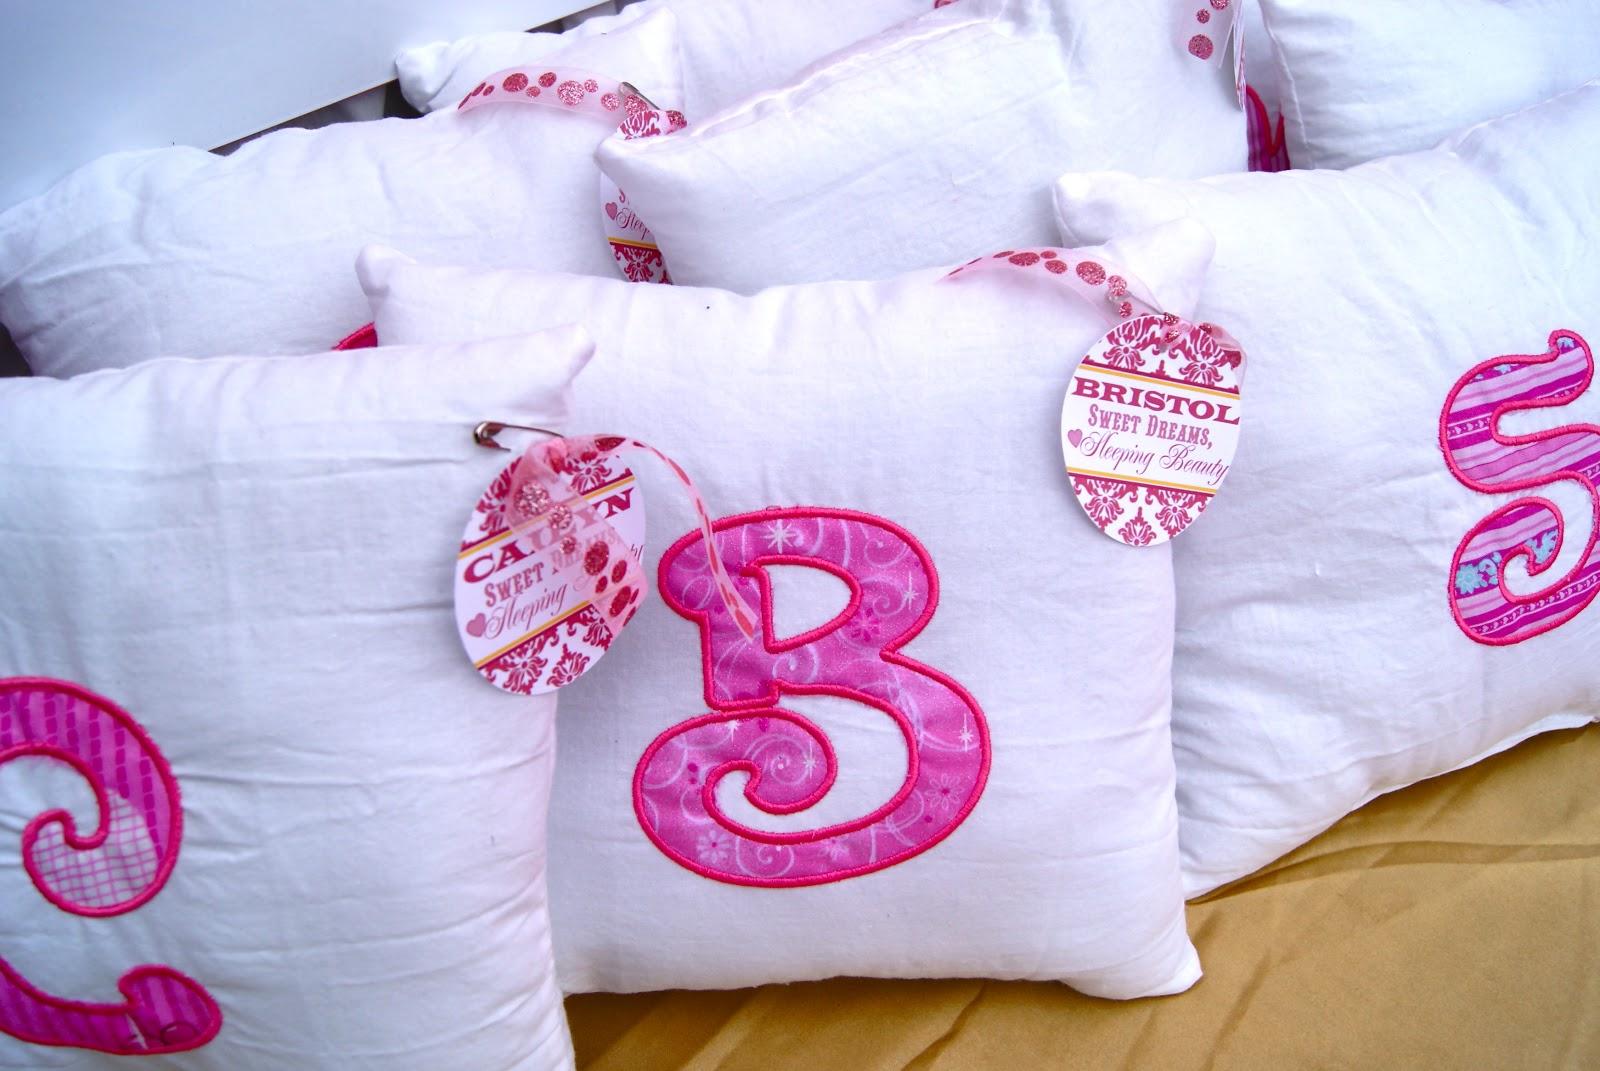 Kami Buchanan Custom Designs 4th Birthday Party for a Princess – Sleeping Beauty Party Invitations